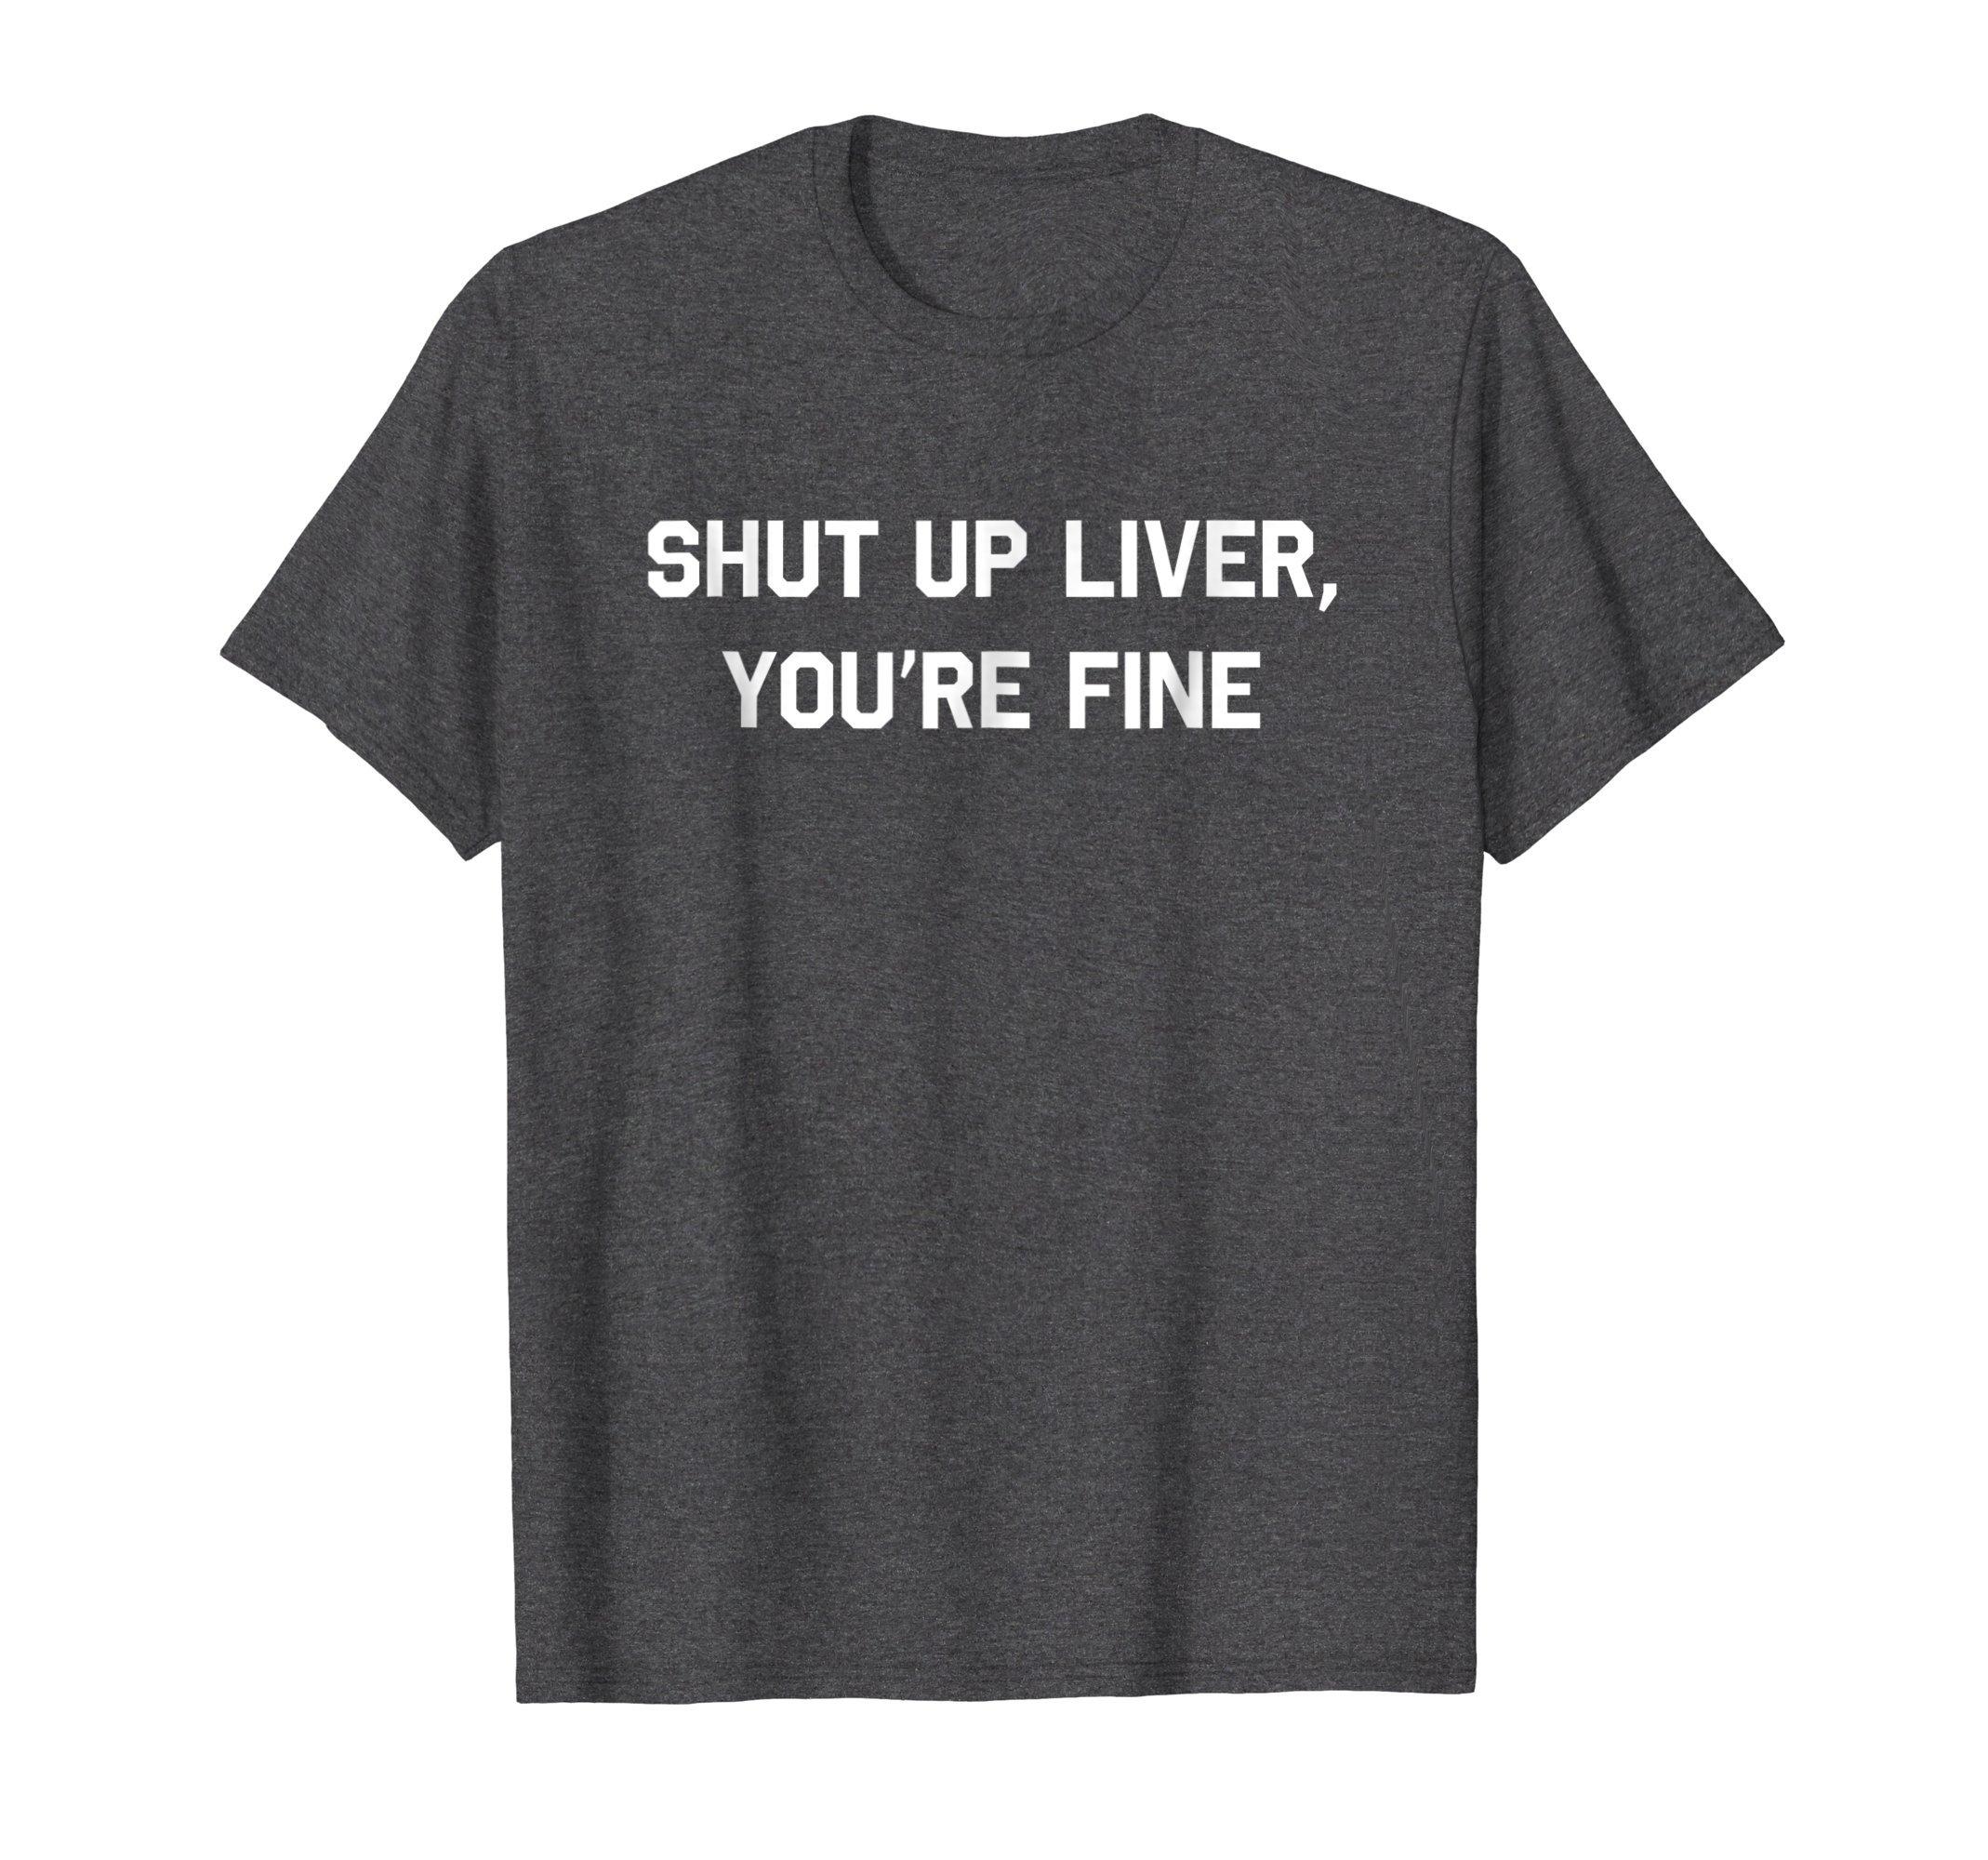 Mens Shut Up Liver You're Fine T-Shirt Funny Sarcastic Drinking XL Dark Heather